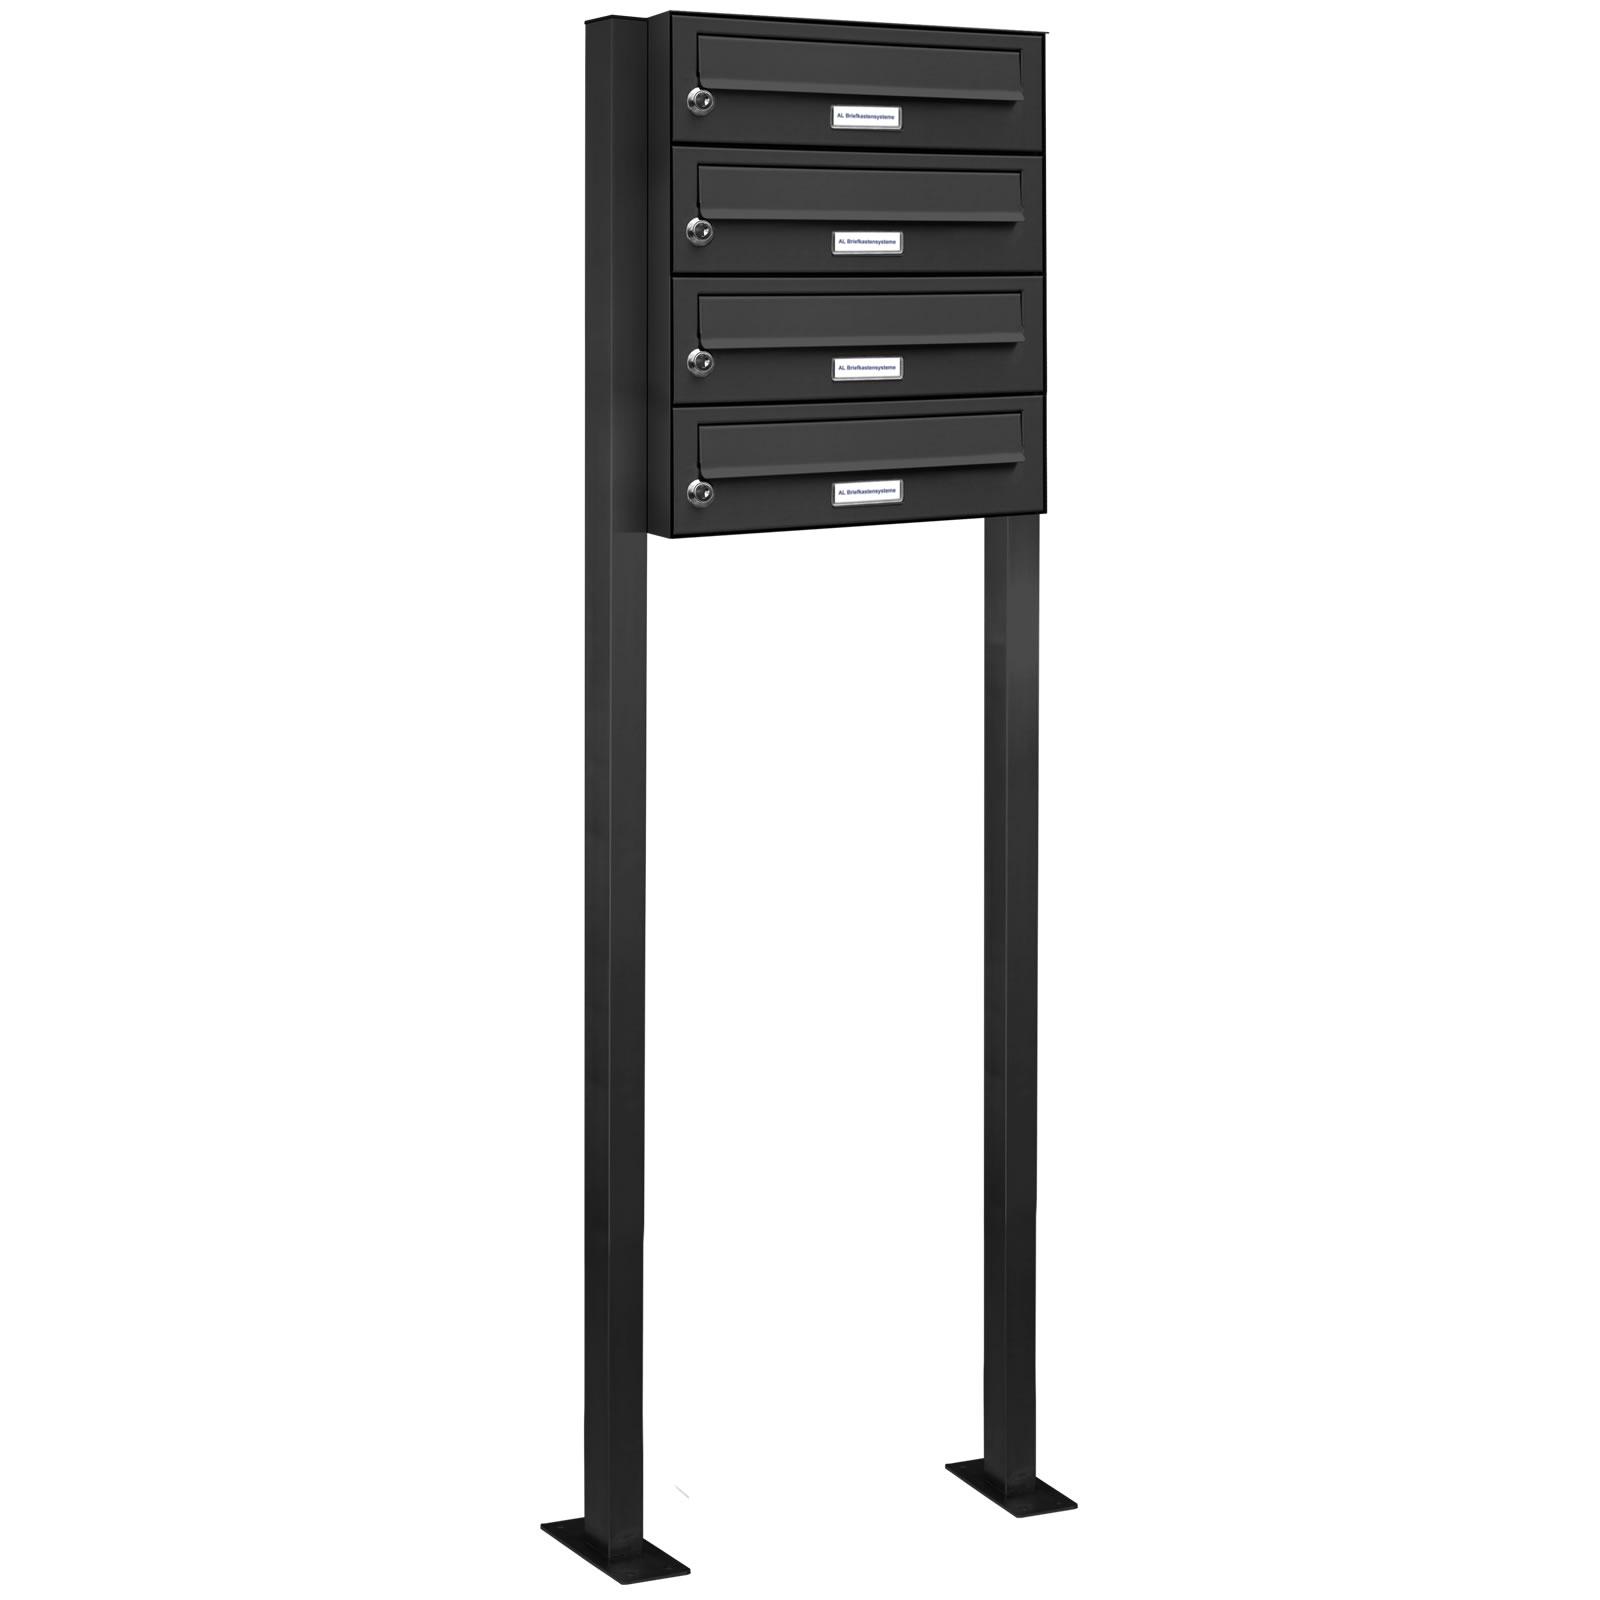 4er standbriefkasten anlage freistehend ral 7016. Black Bedroom Furniture Sets. Home Design Ideas